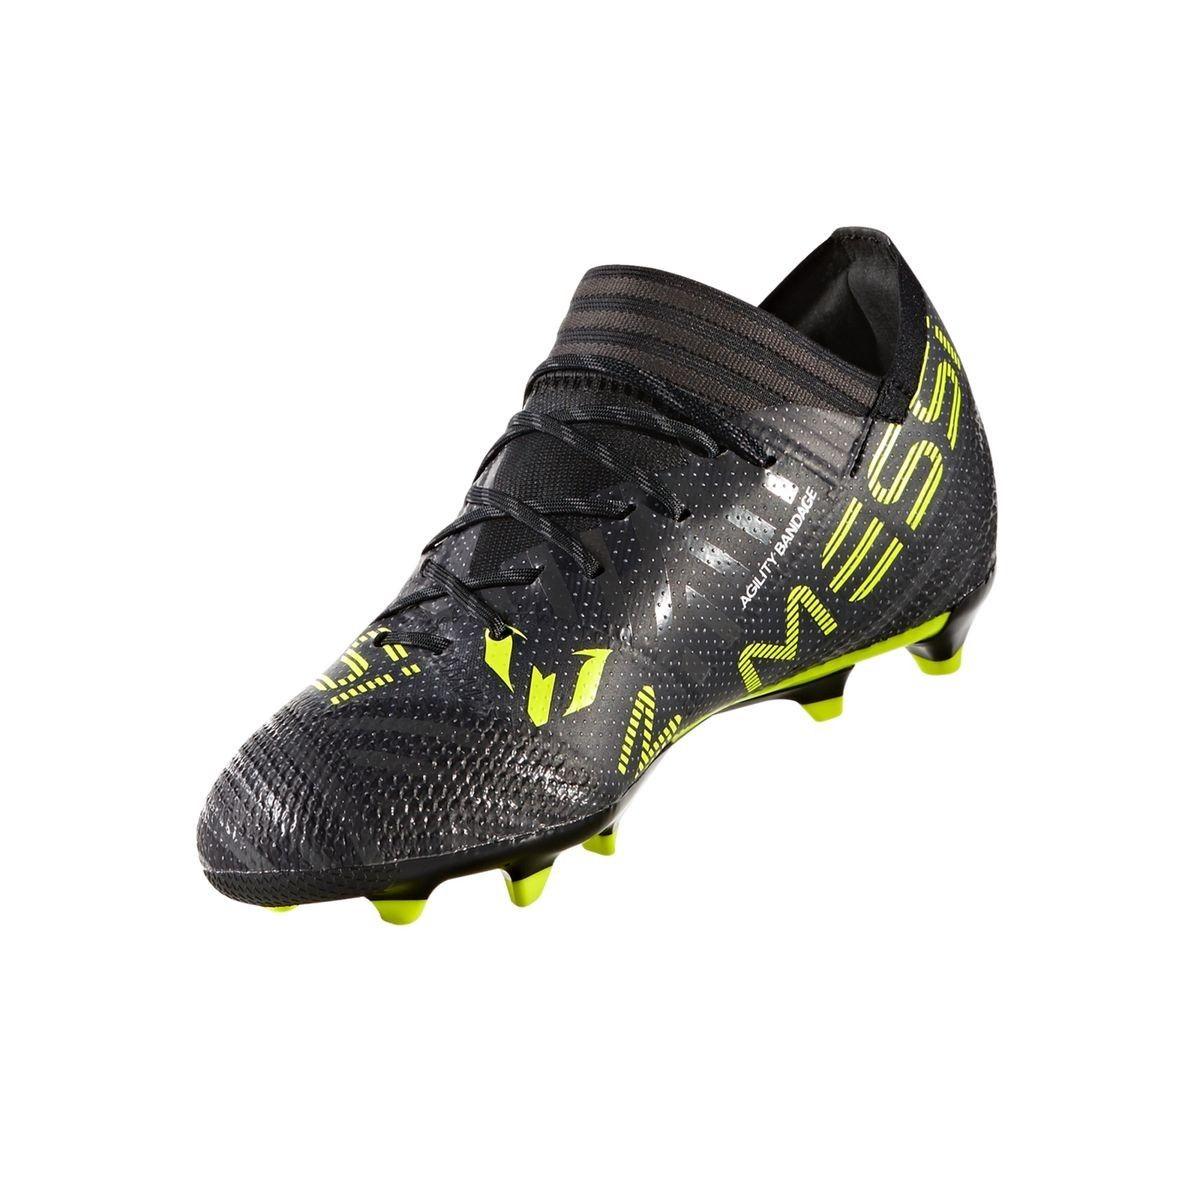 Chaussures Football Adidas Nemeziz Messi 17.1 Fg Noir Junior